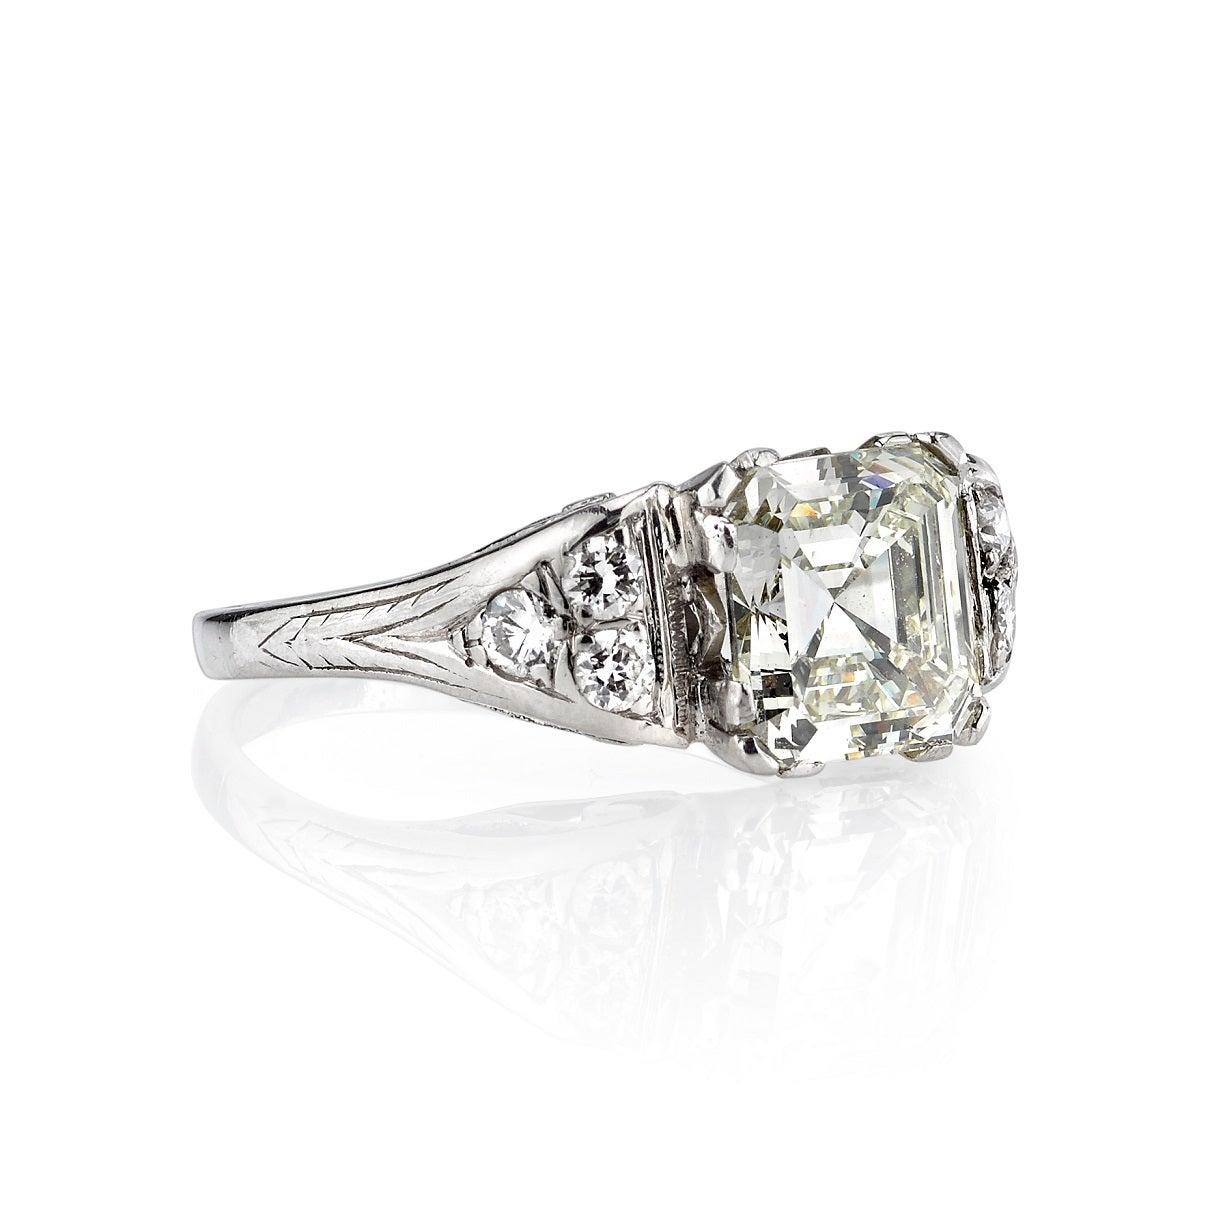 2 38ct vintage asscher cut engagement ring at 1stdibs